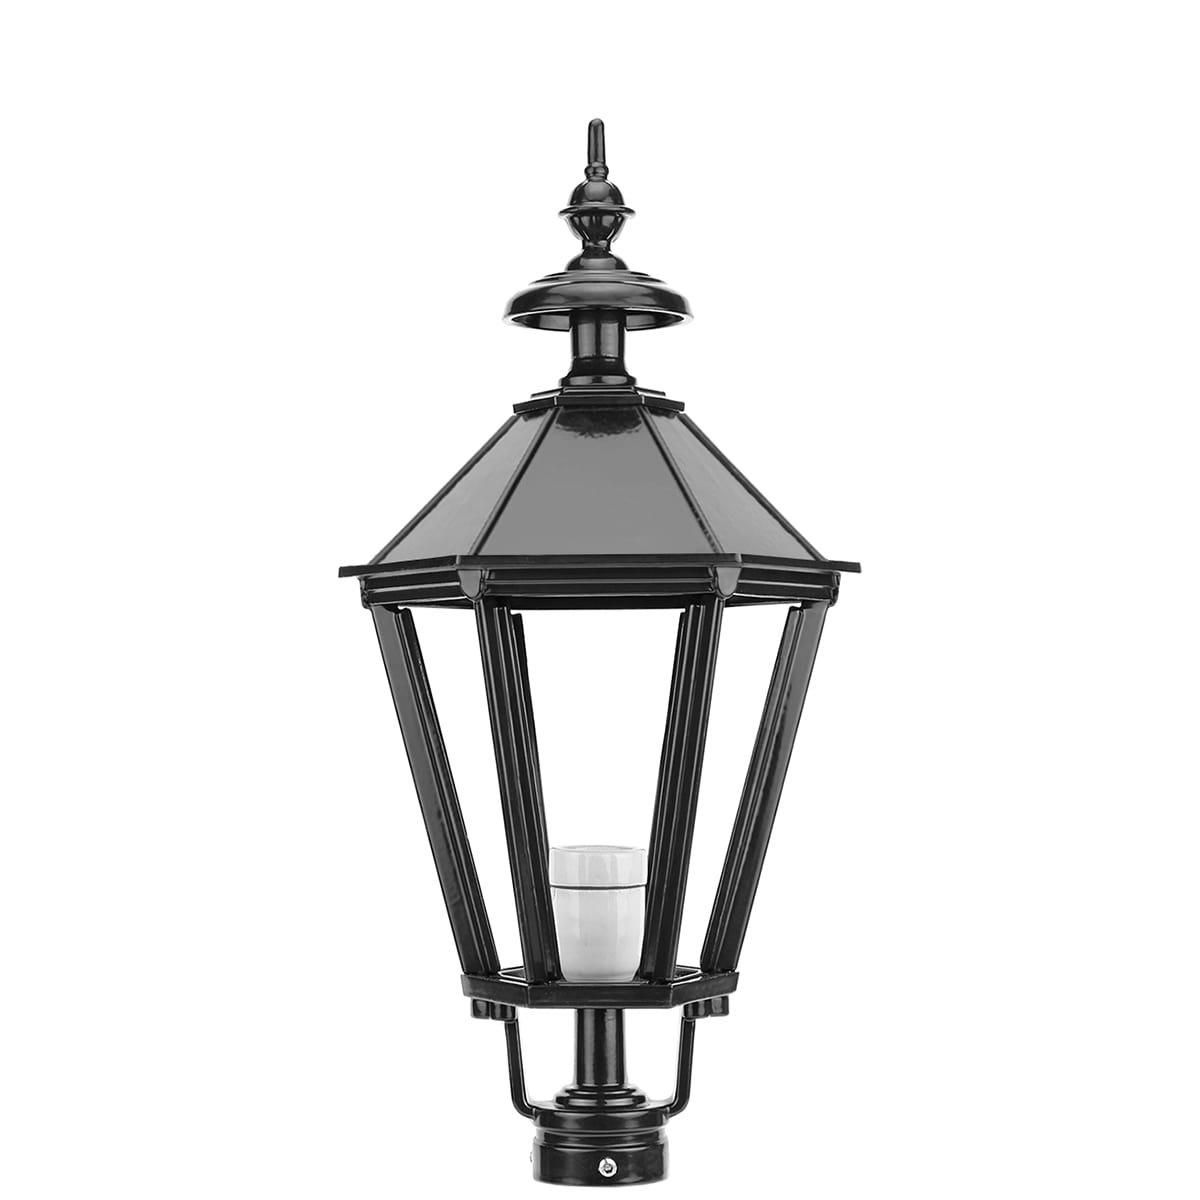 Outdoor lighting Classic Rural Loose lantern shade K12 - 63 cm